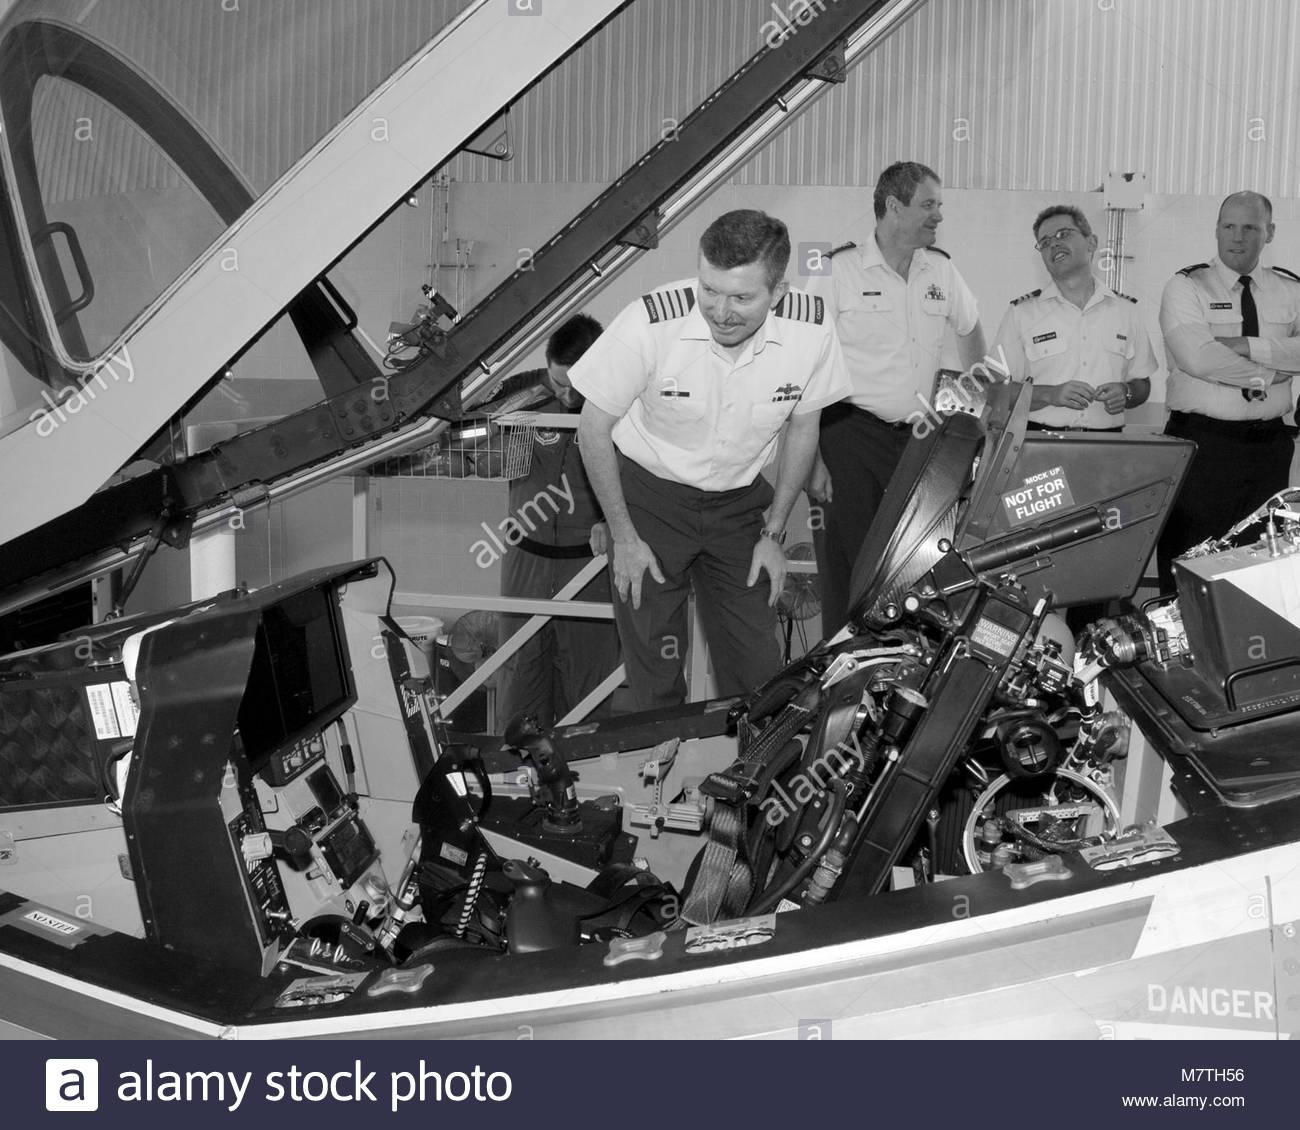 CAS Visit. 26-37094  6 September 2006 Lockheed Martin Plant, Fort Worth, Texas  Colonel Dave C. Burt, Director Air - Stock Image